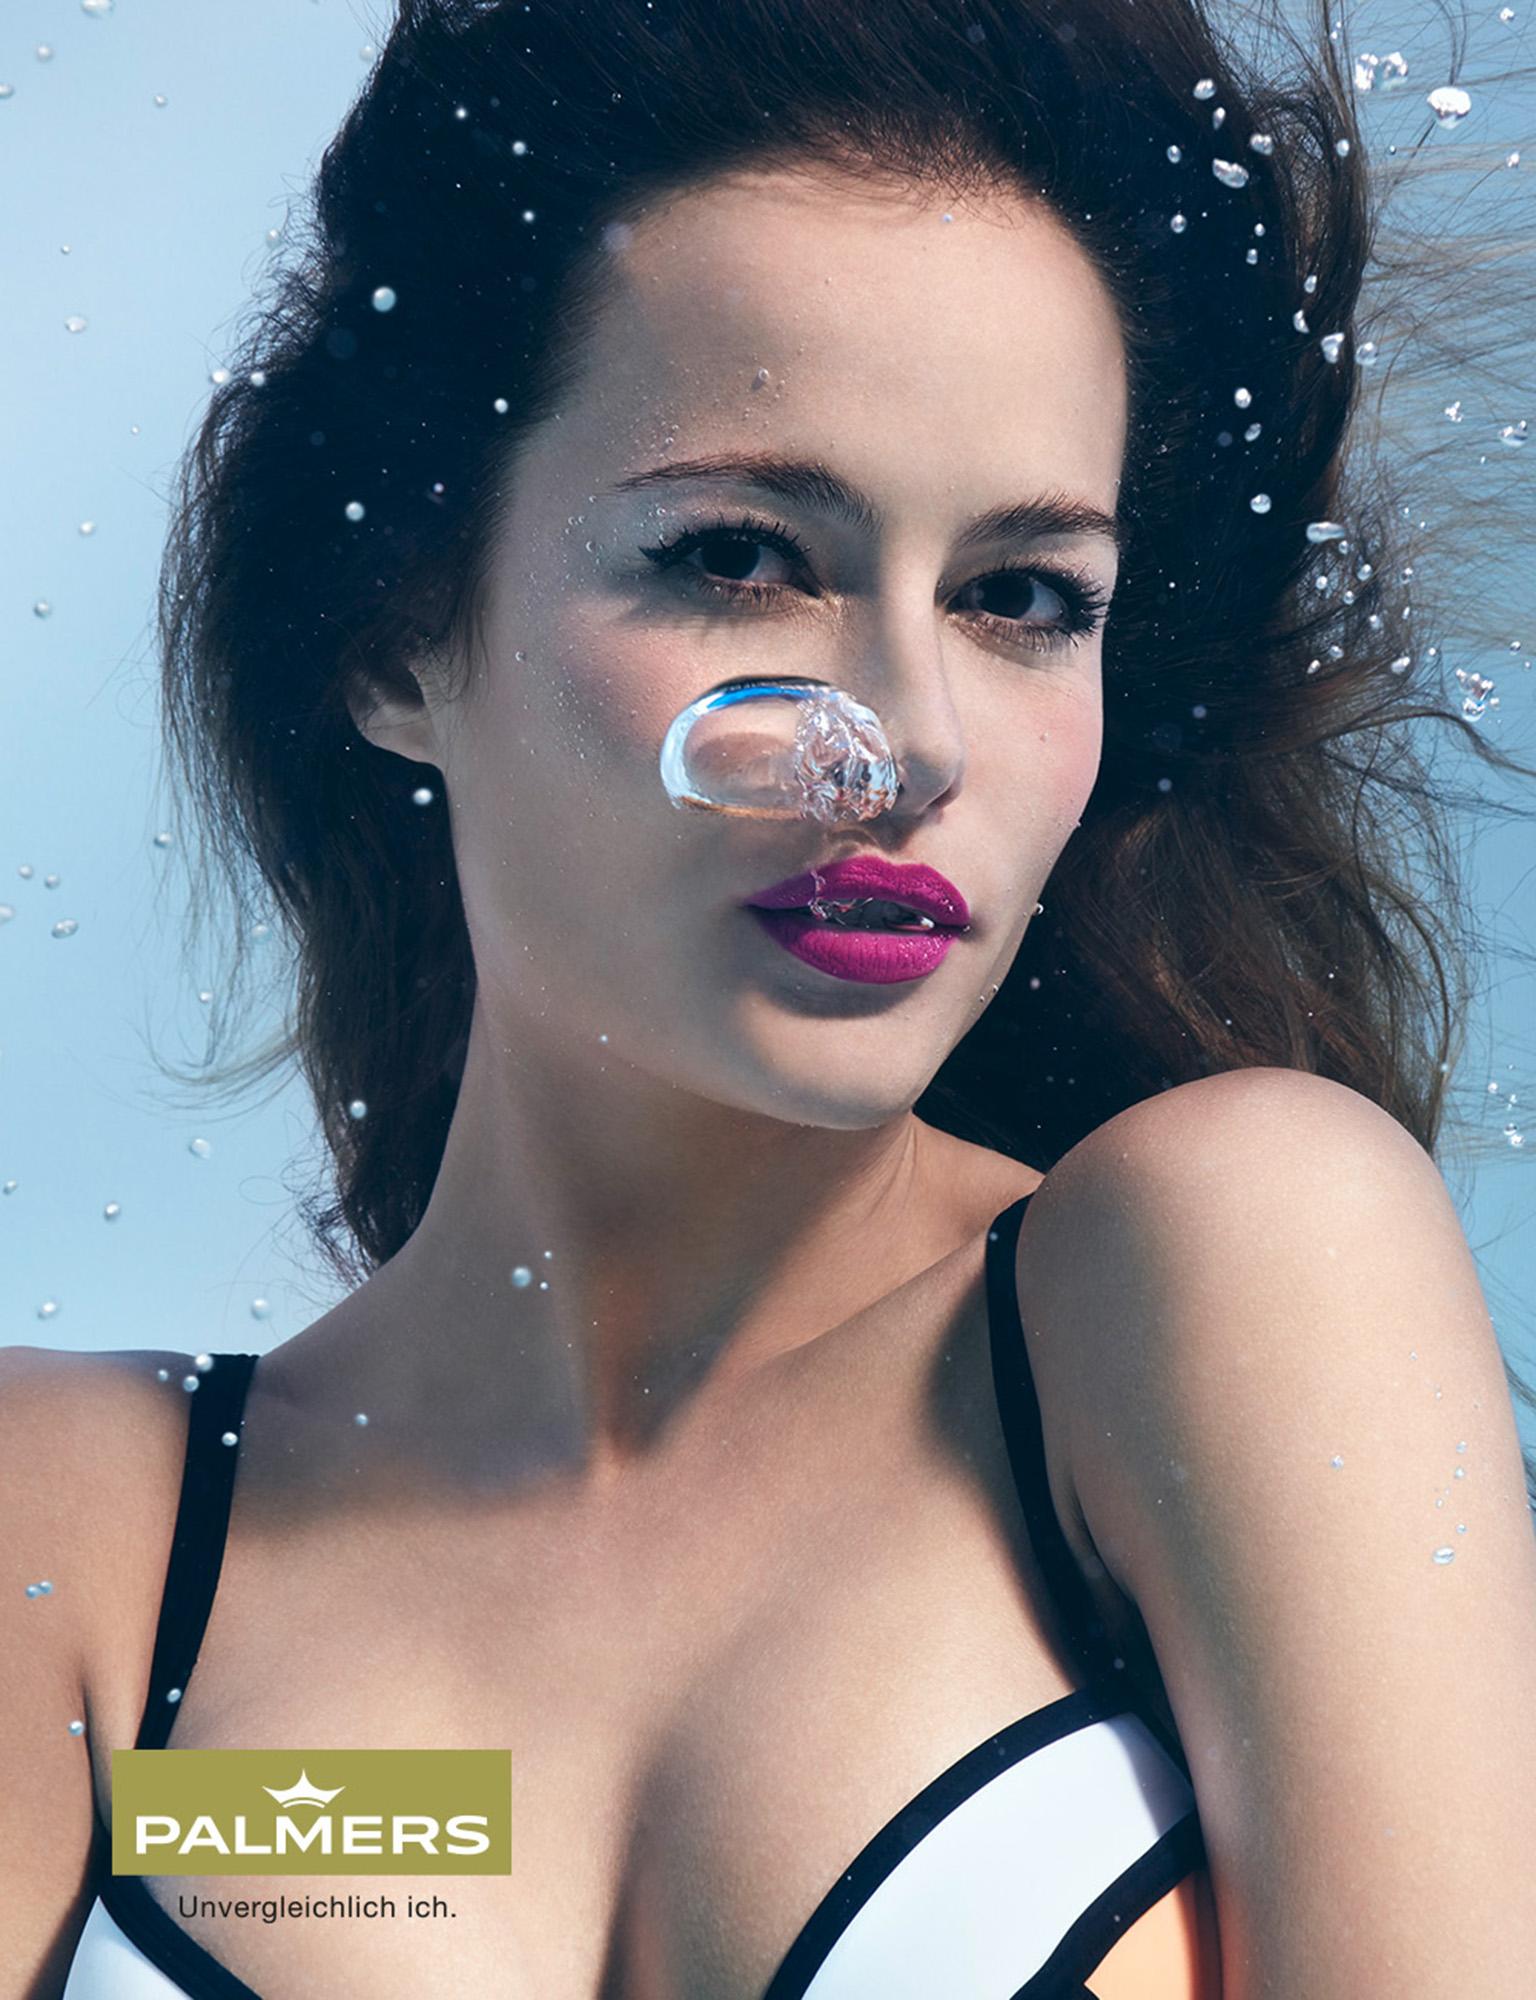 Susanne Stemmer portrait of girl underwater in black and white bikini